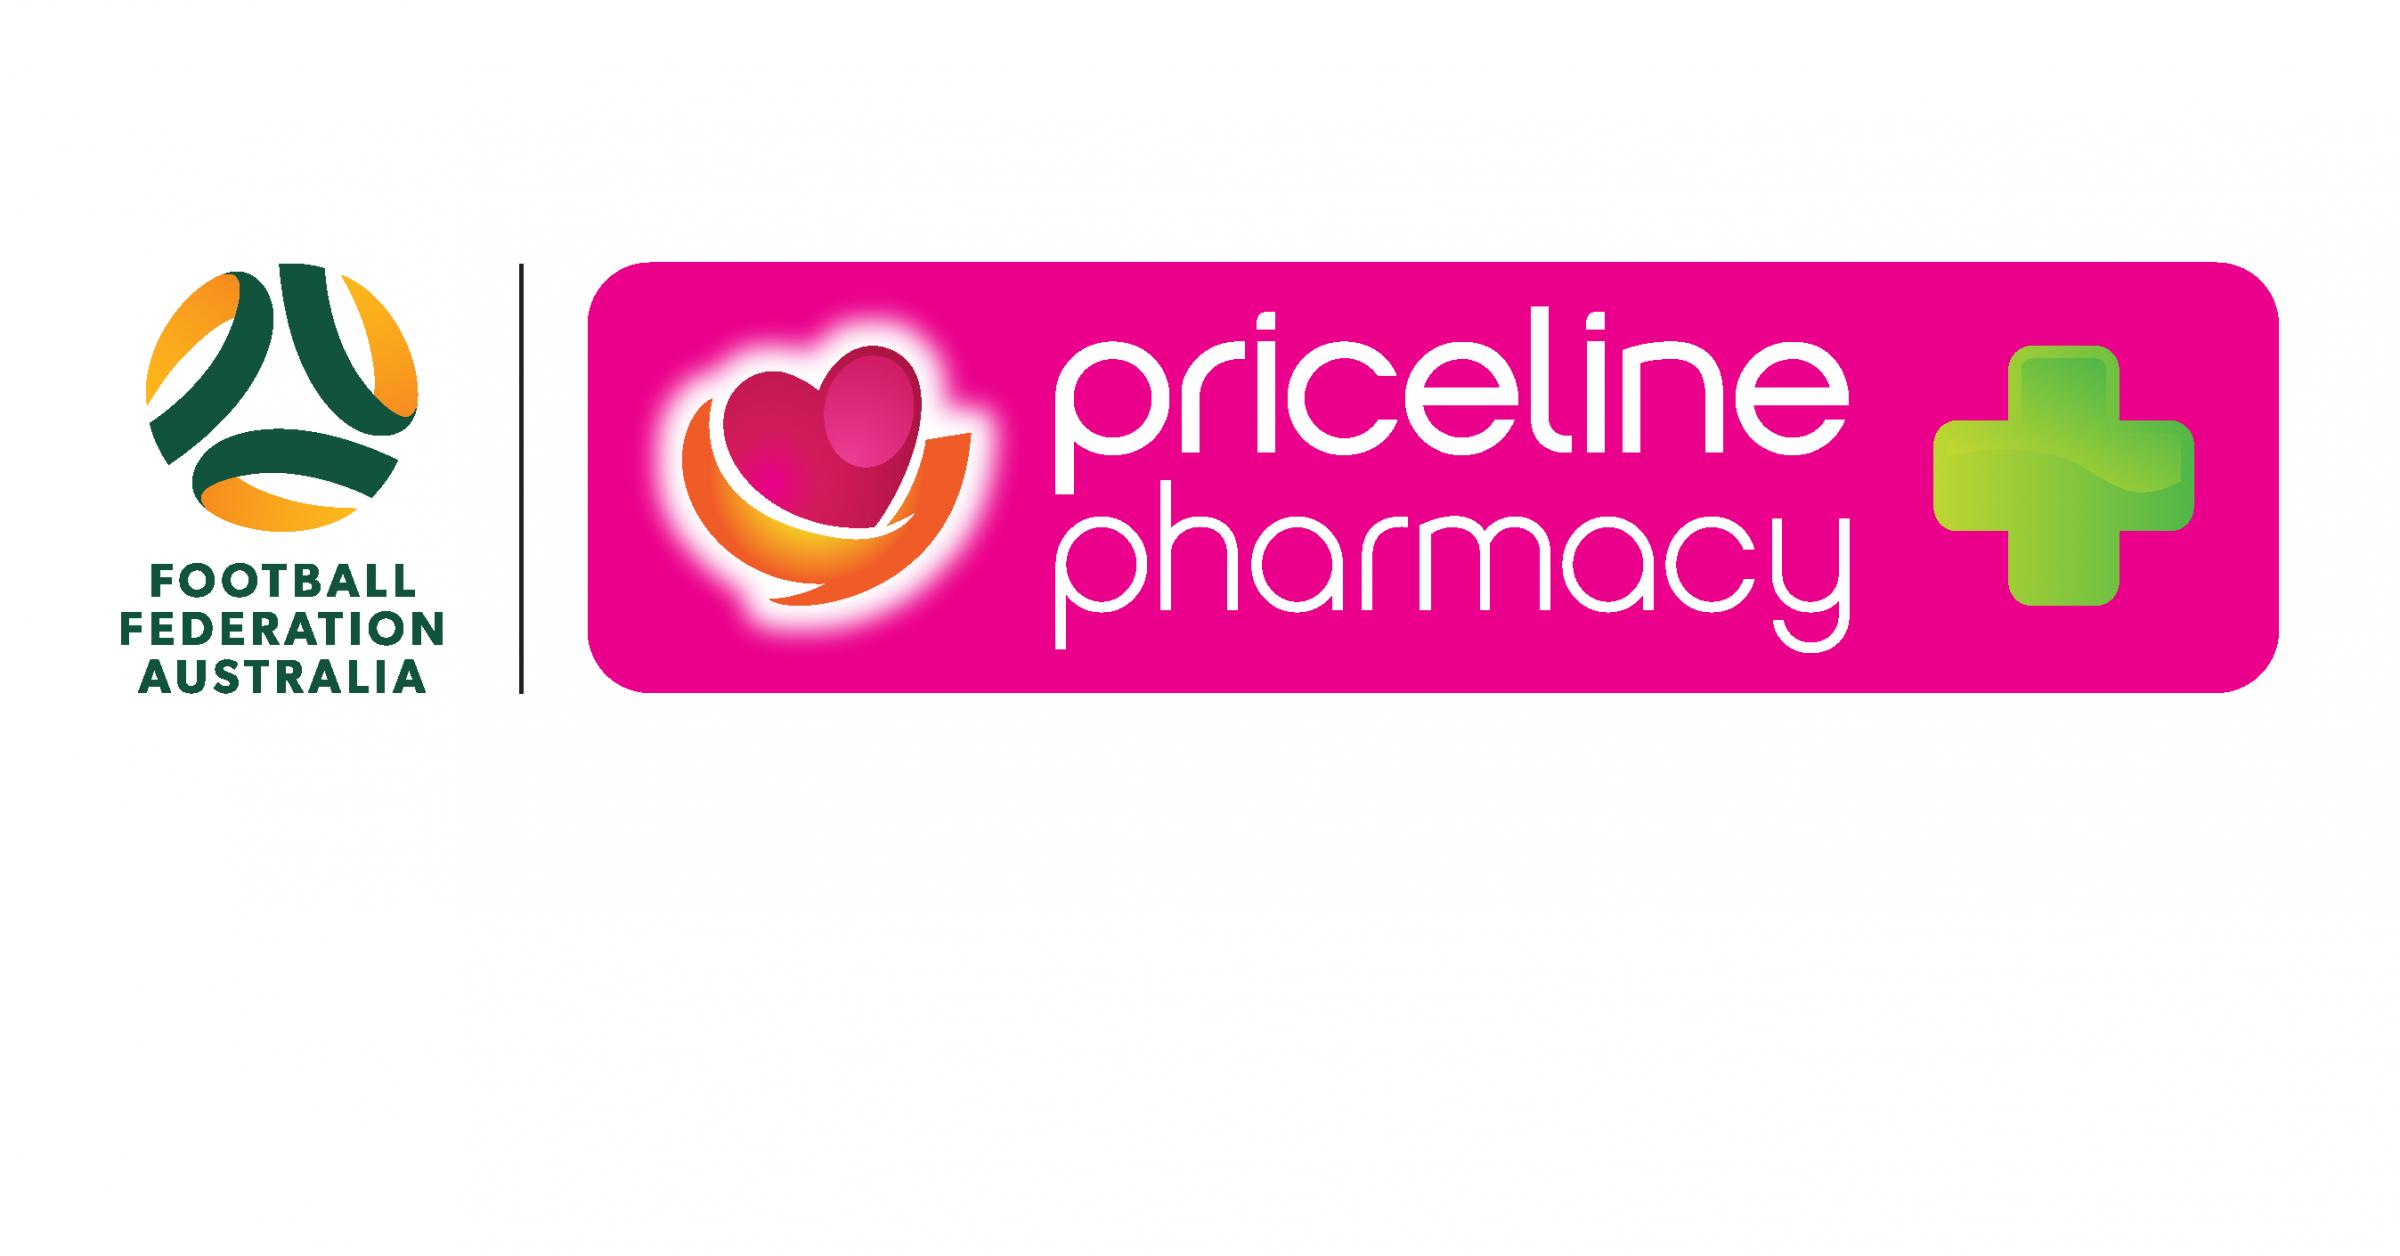 FFA Priceline announcement